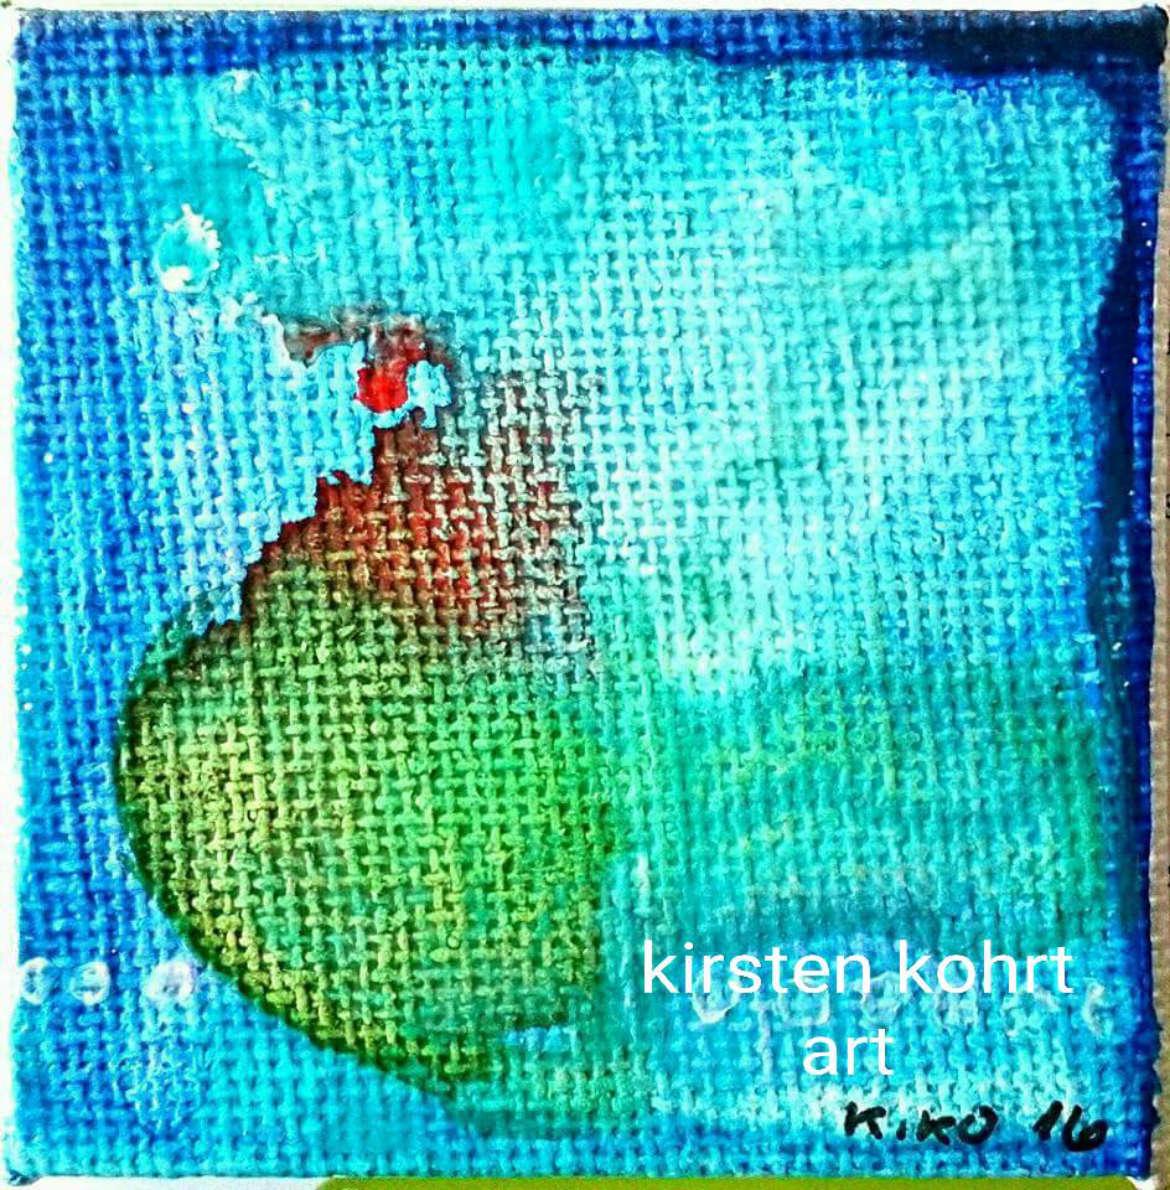 Kirsten Kohrt /                        Ki-Tüpfelchen